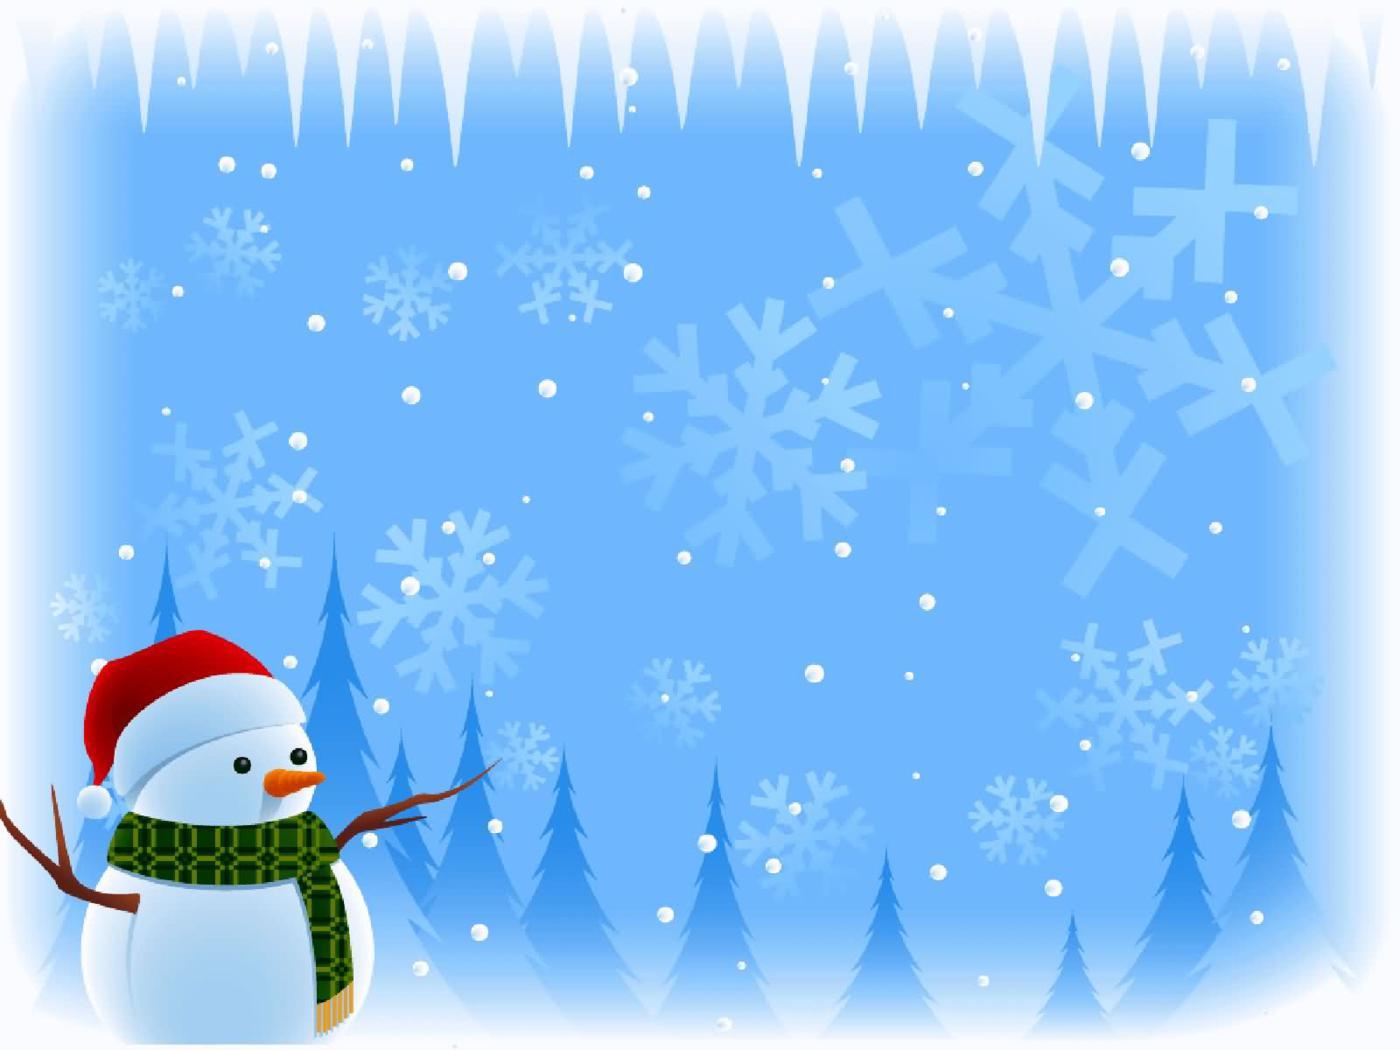 PC Wallpapers   Christmas Desktop Wallpaper Backgrounds 1400x1050